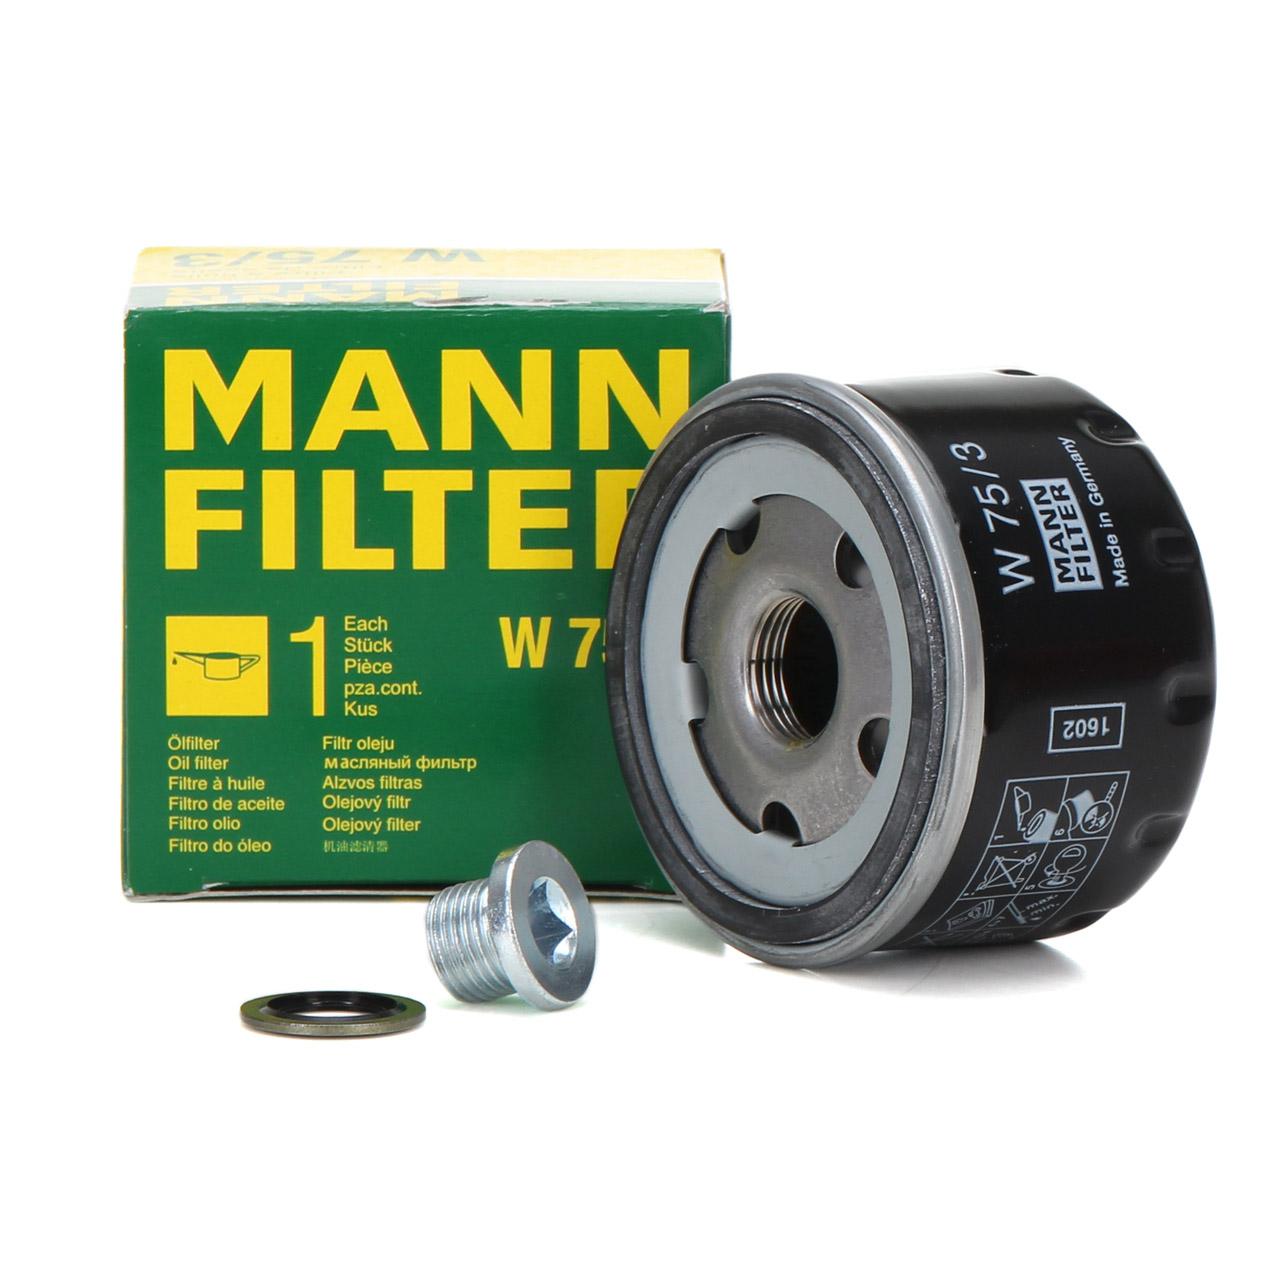 MANN W75/3 Ölfilter + Ölablassschraube RENAULT Clio Laguna Megane Scenic Twingo